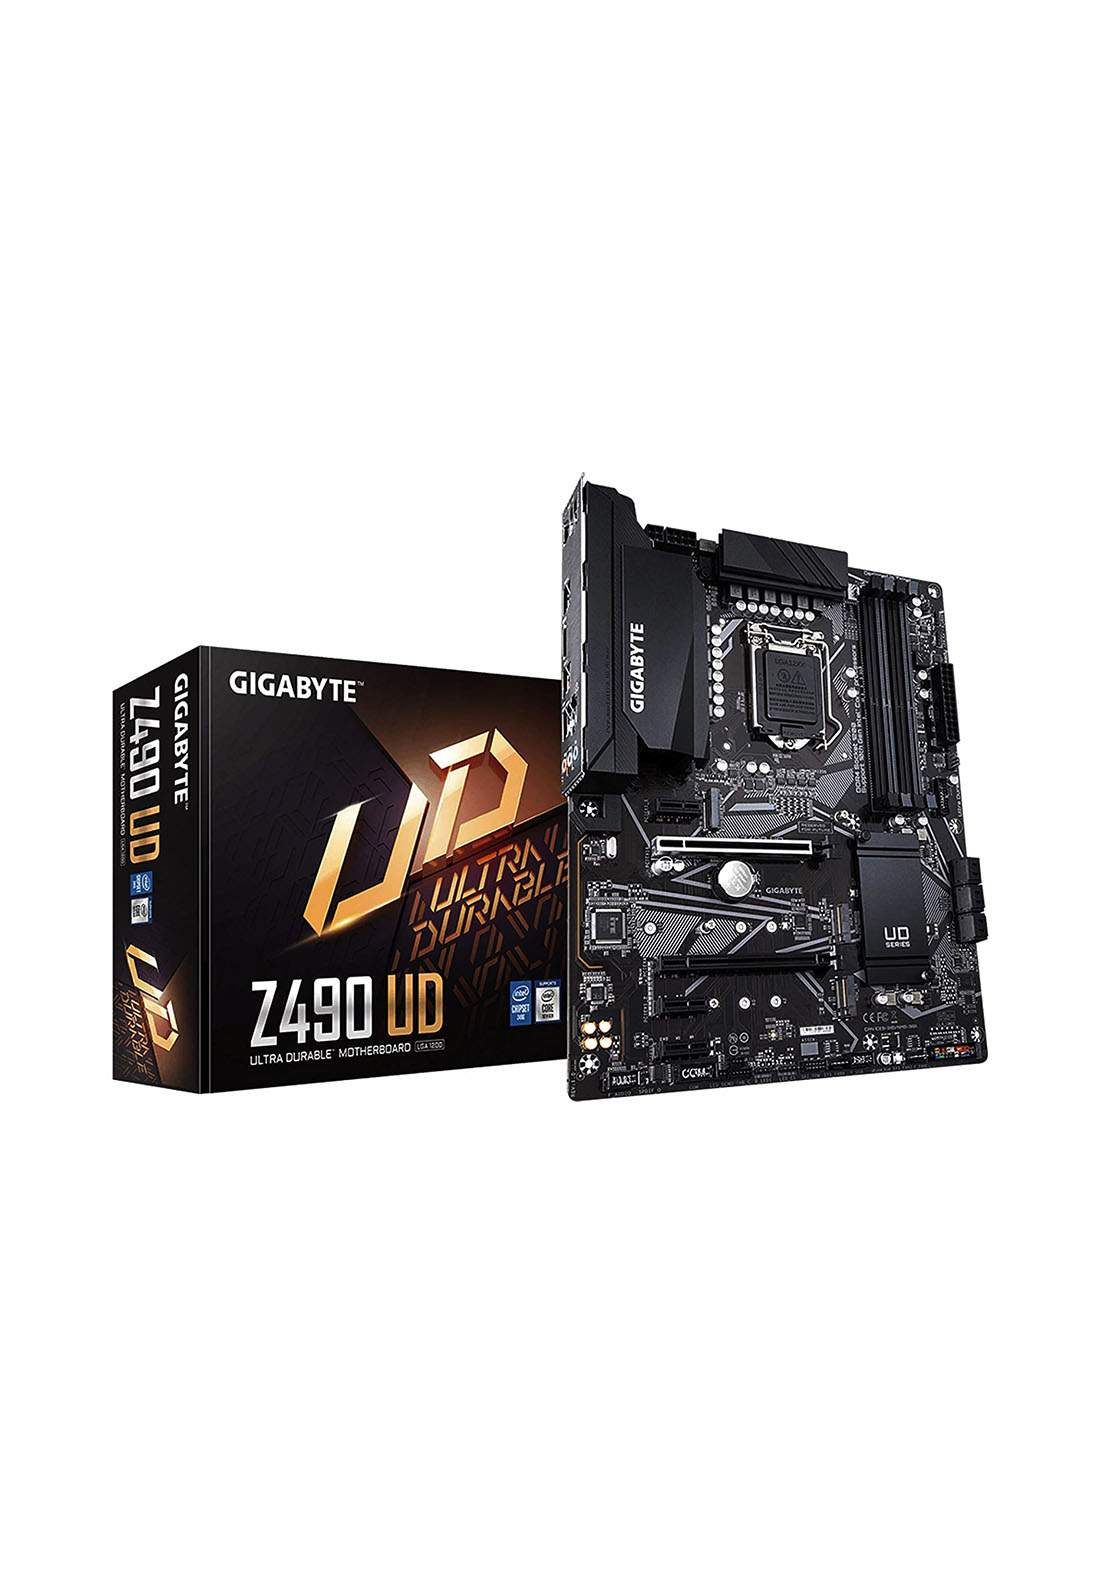 Gigabyte Ud Z490 Atx Lga1200 Motherboard-Black لوحة الام